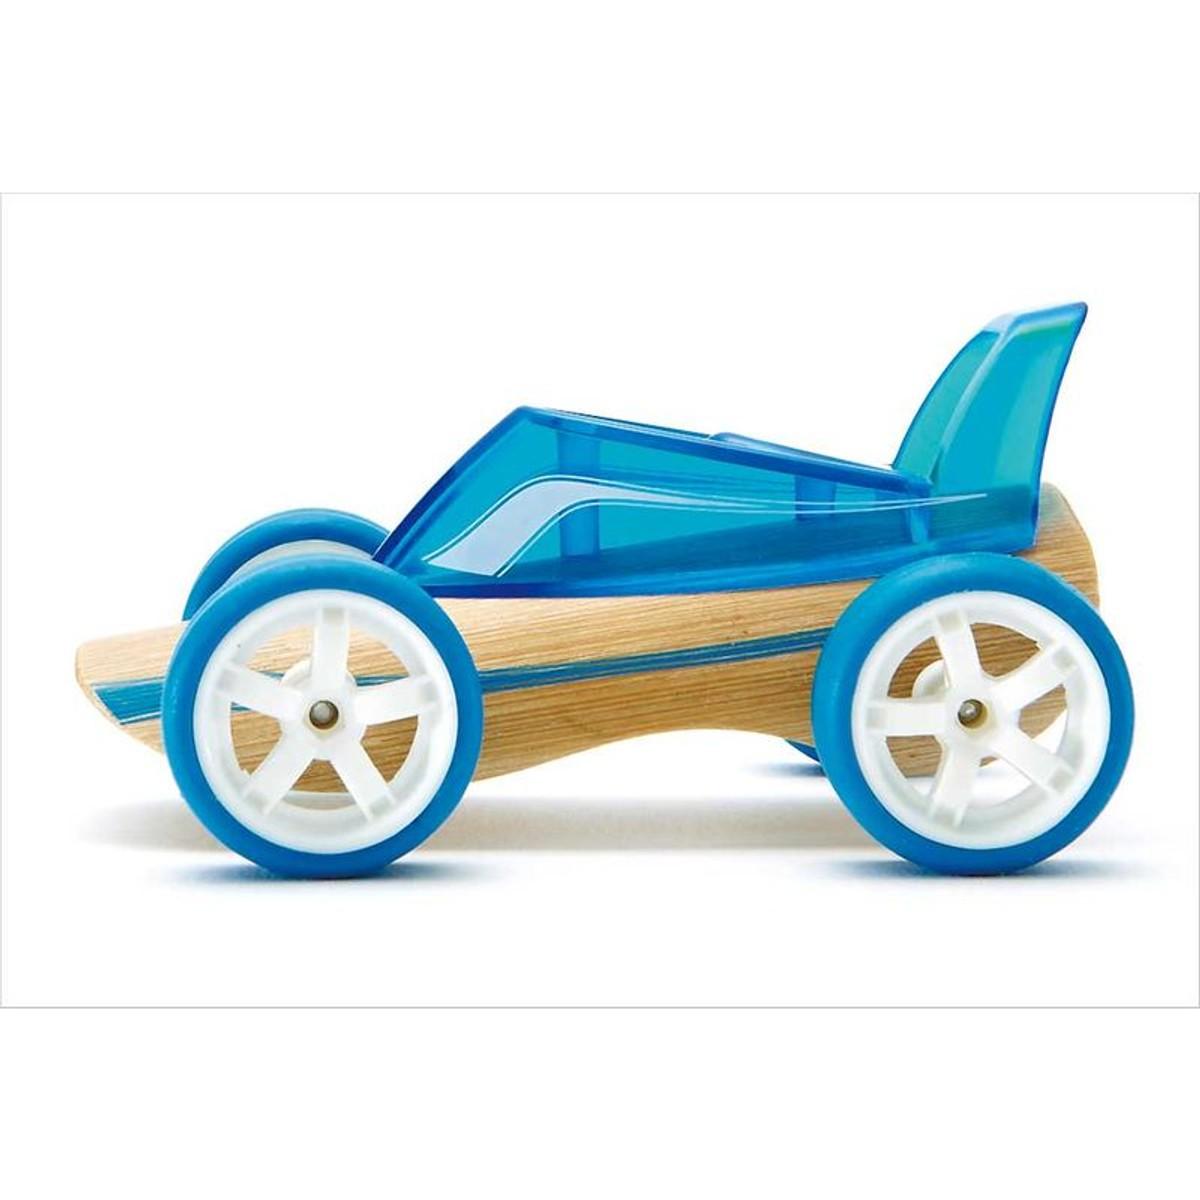 Bambou Voiture JouetEt RoadsterProducts Jouet QrdtsBhCx